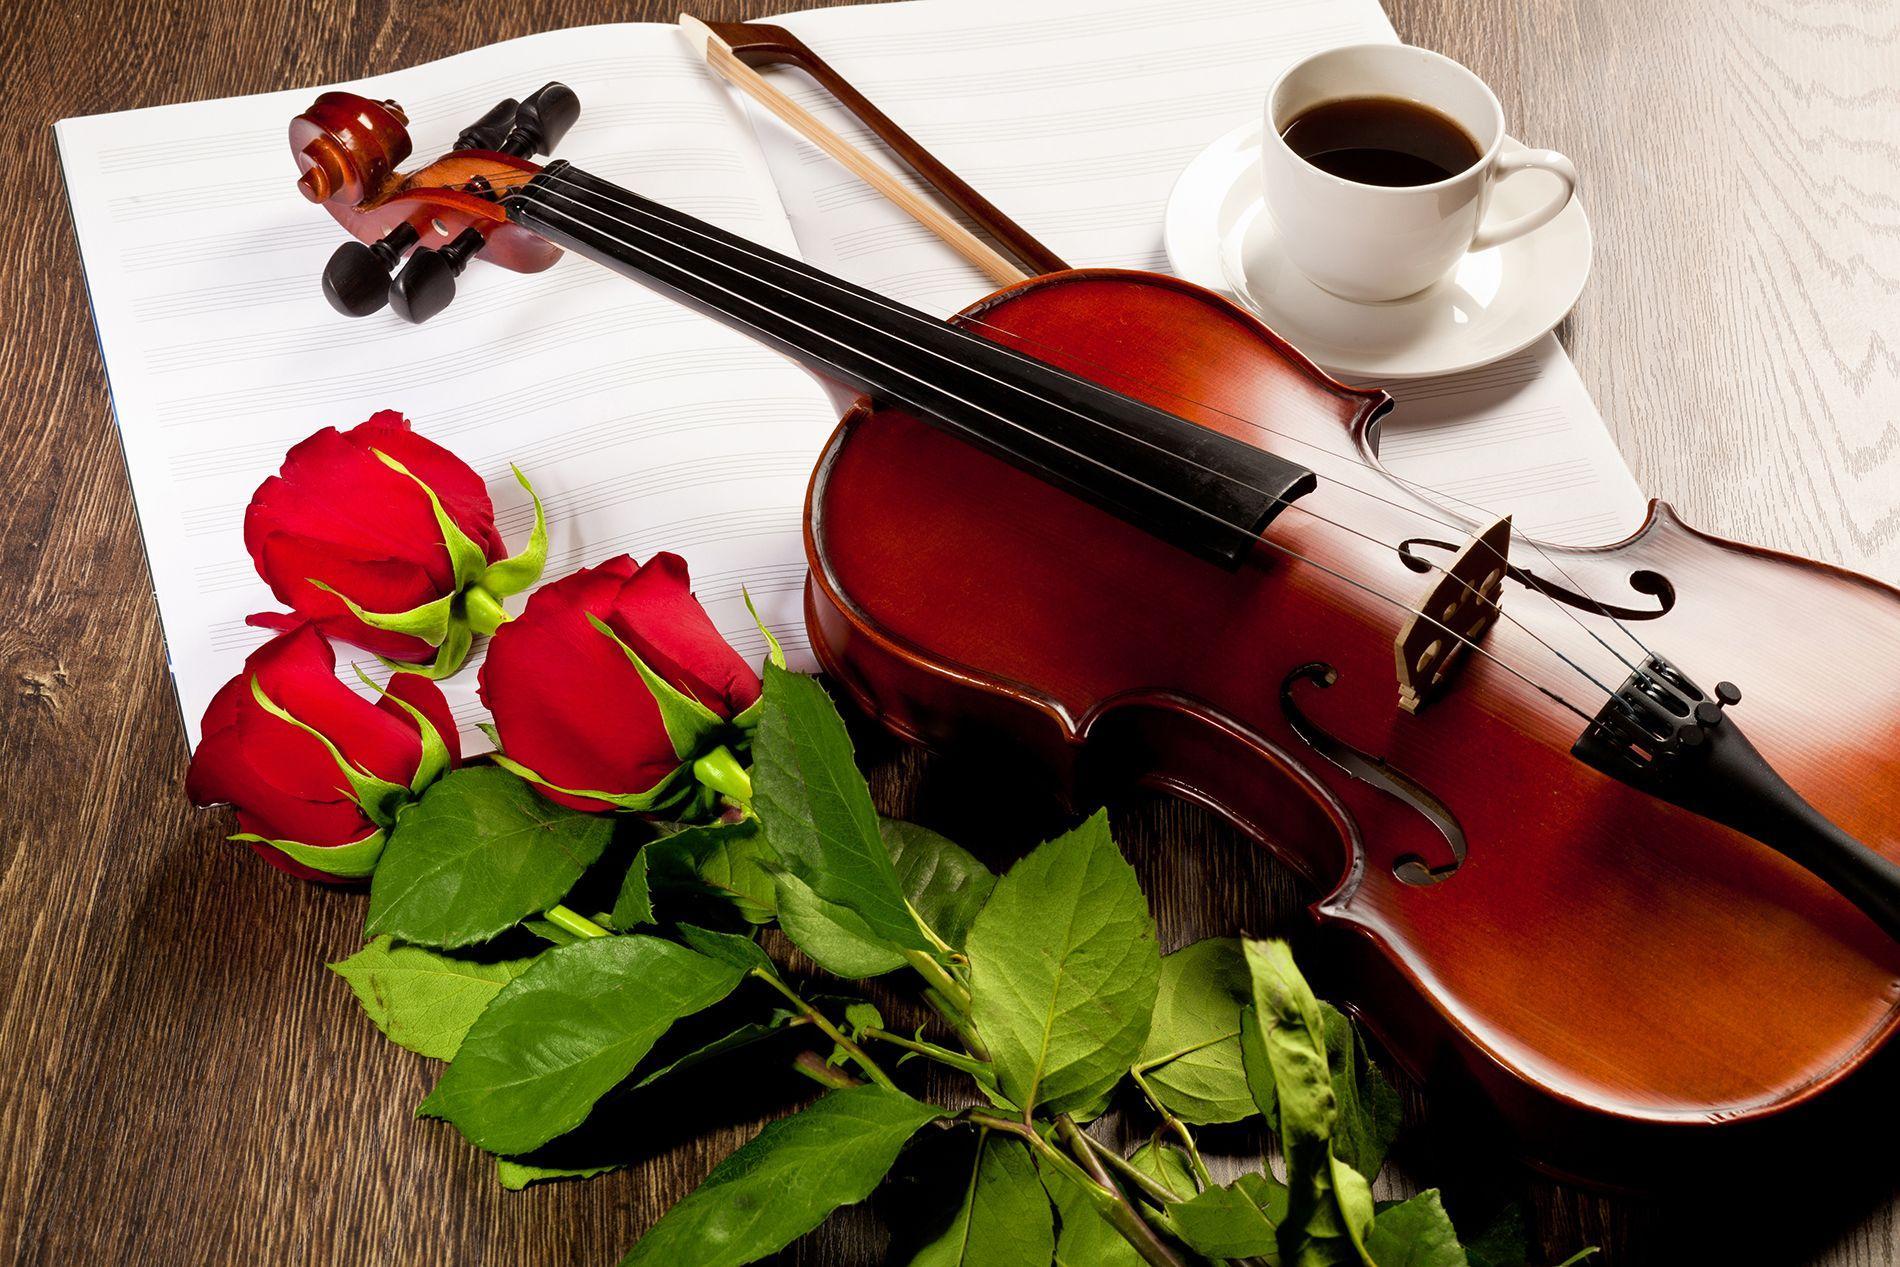 Violin Roses Wallpapers Top Free Violin Roses Backgrounds Wallpaperaccess